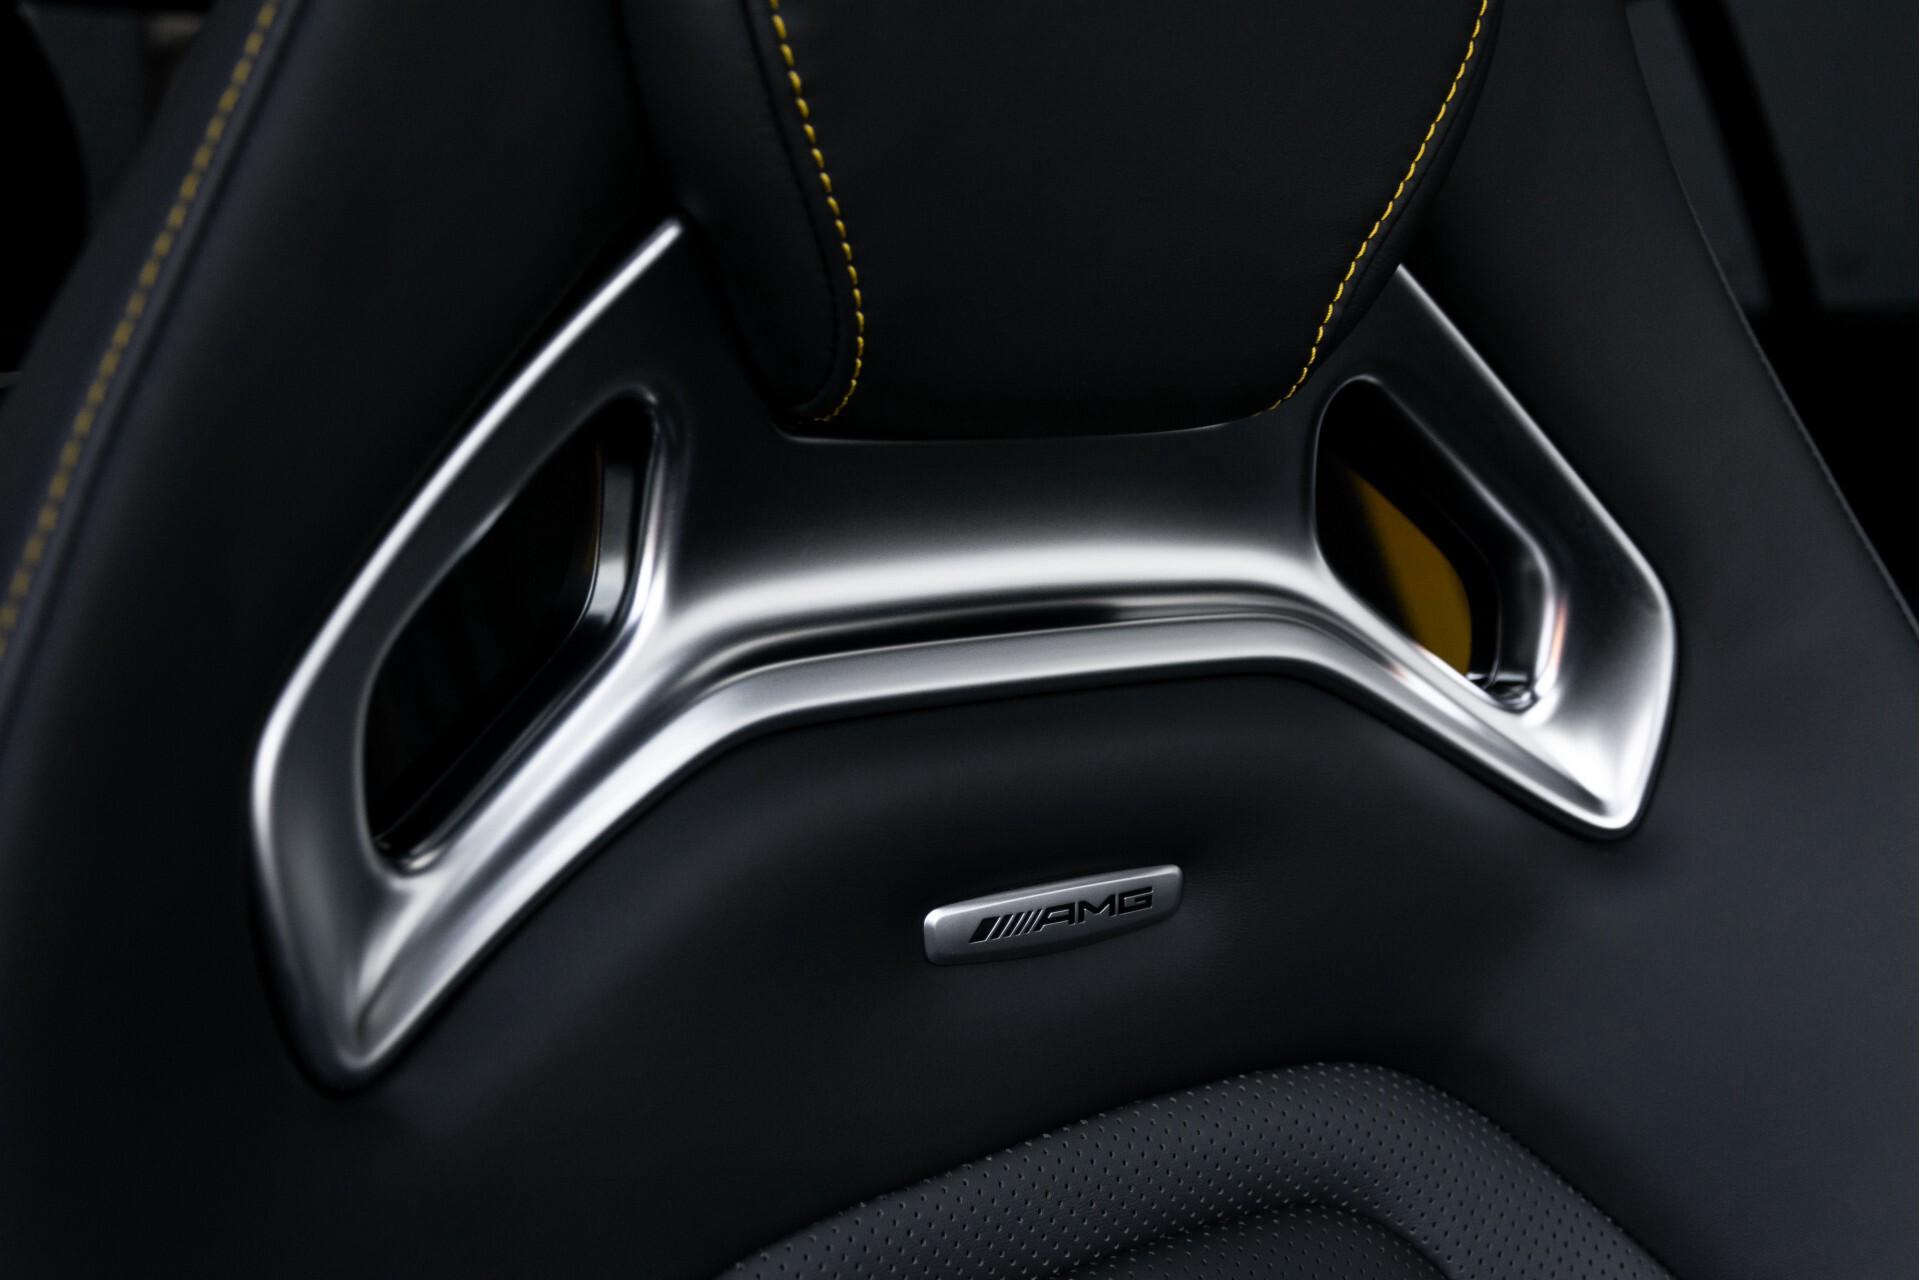 Mercedes-Benz AMG GT 4-Door Coupe 63 S 4MATIC+ Edition 1 Keramisch/Carbon/First Class/Dynamic Plus/Burmester High End 3D Aut9 Foto 59